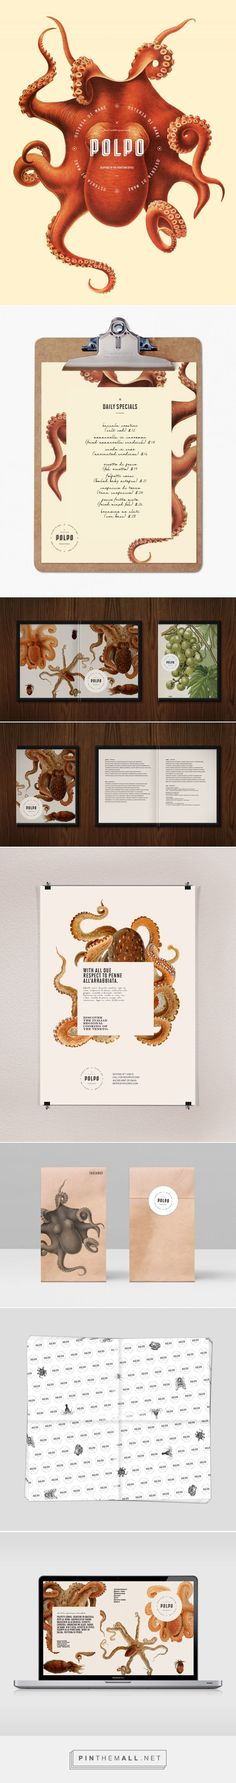 Polpo Restaurant Branding and Menu Design by Richard Marazzi   Fivestar Branding Agency – Design and Branding Agency & Inspiration Gallery